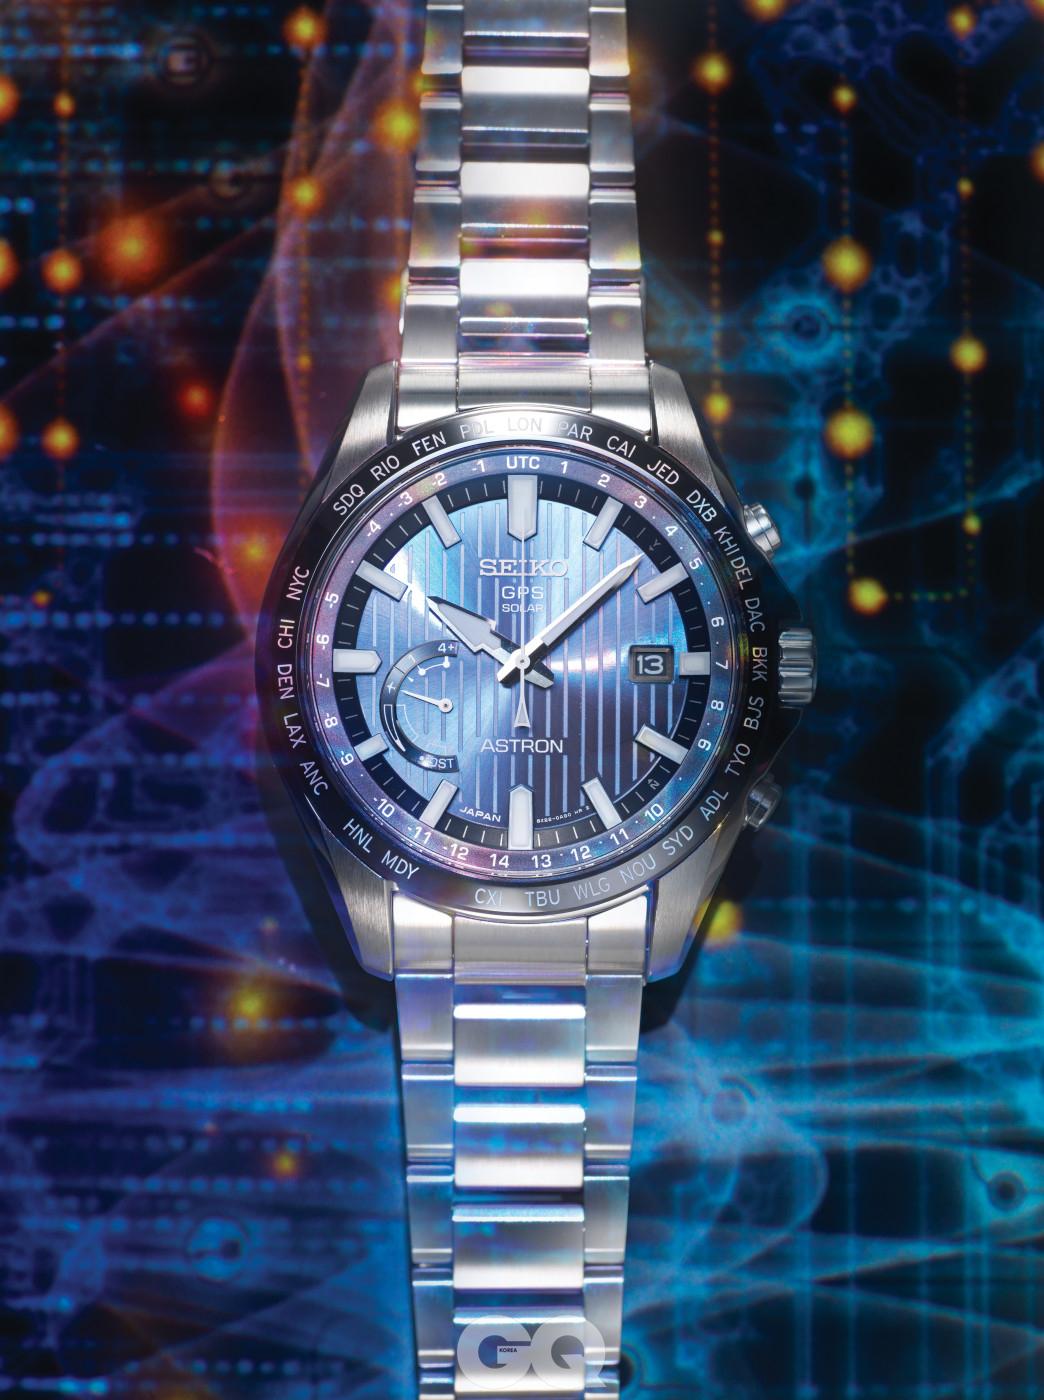 180712 GQ(watch)_6965